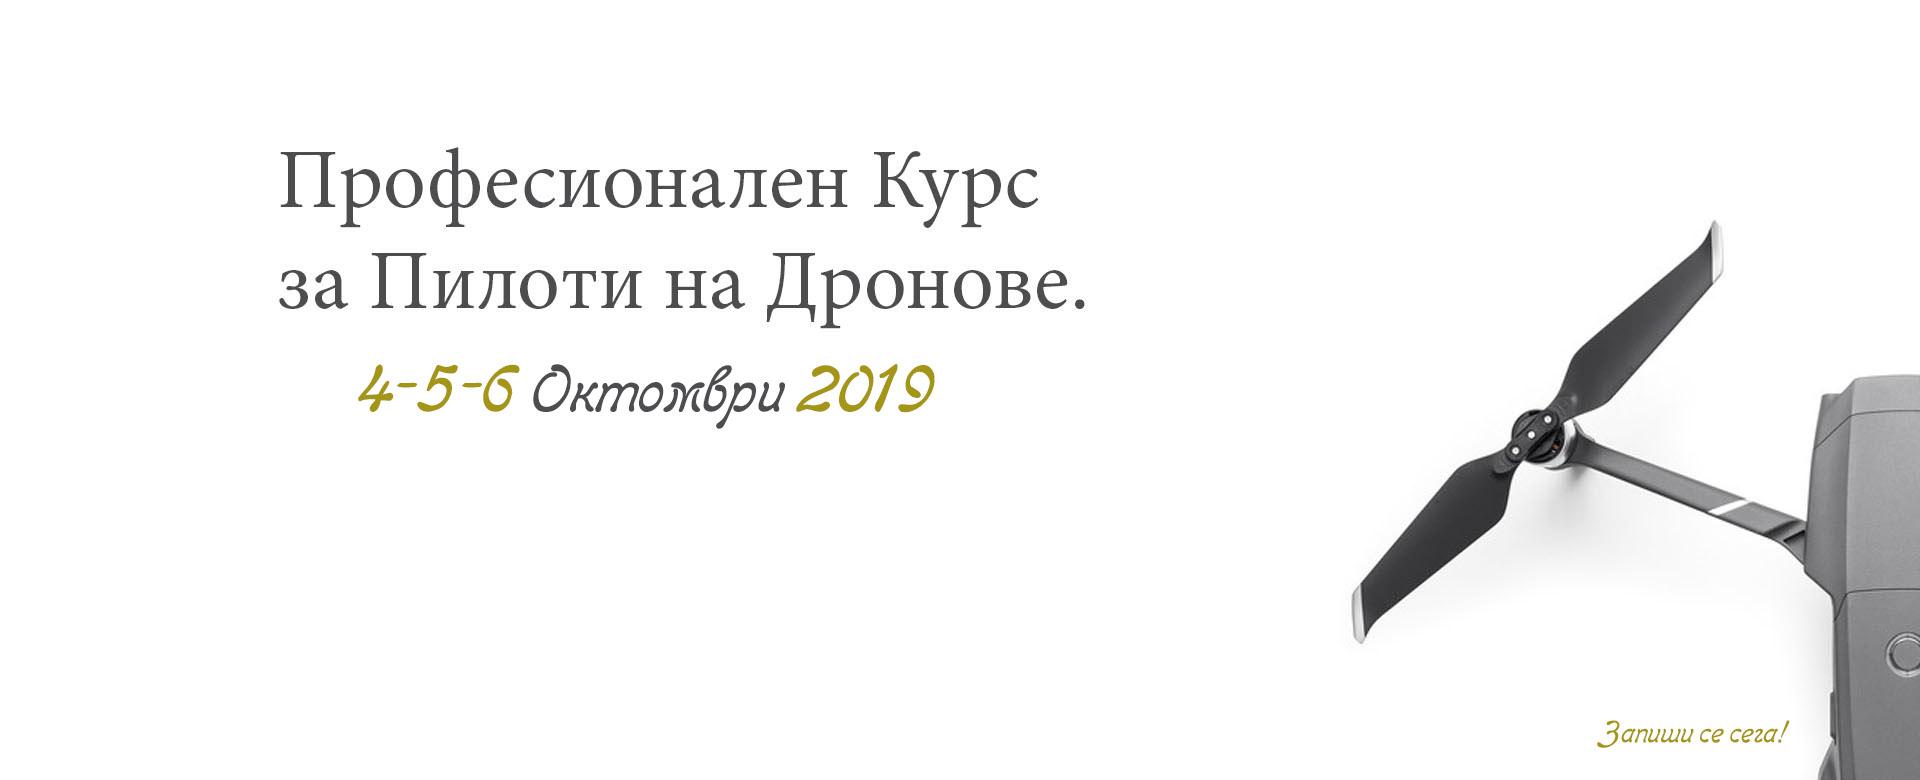 Курс за пилоти на дронове - 4,5,6 Октомври 2019